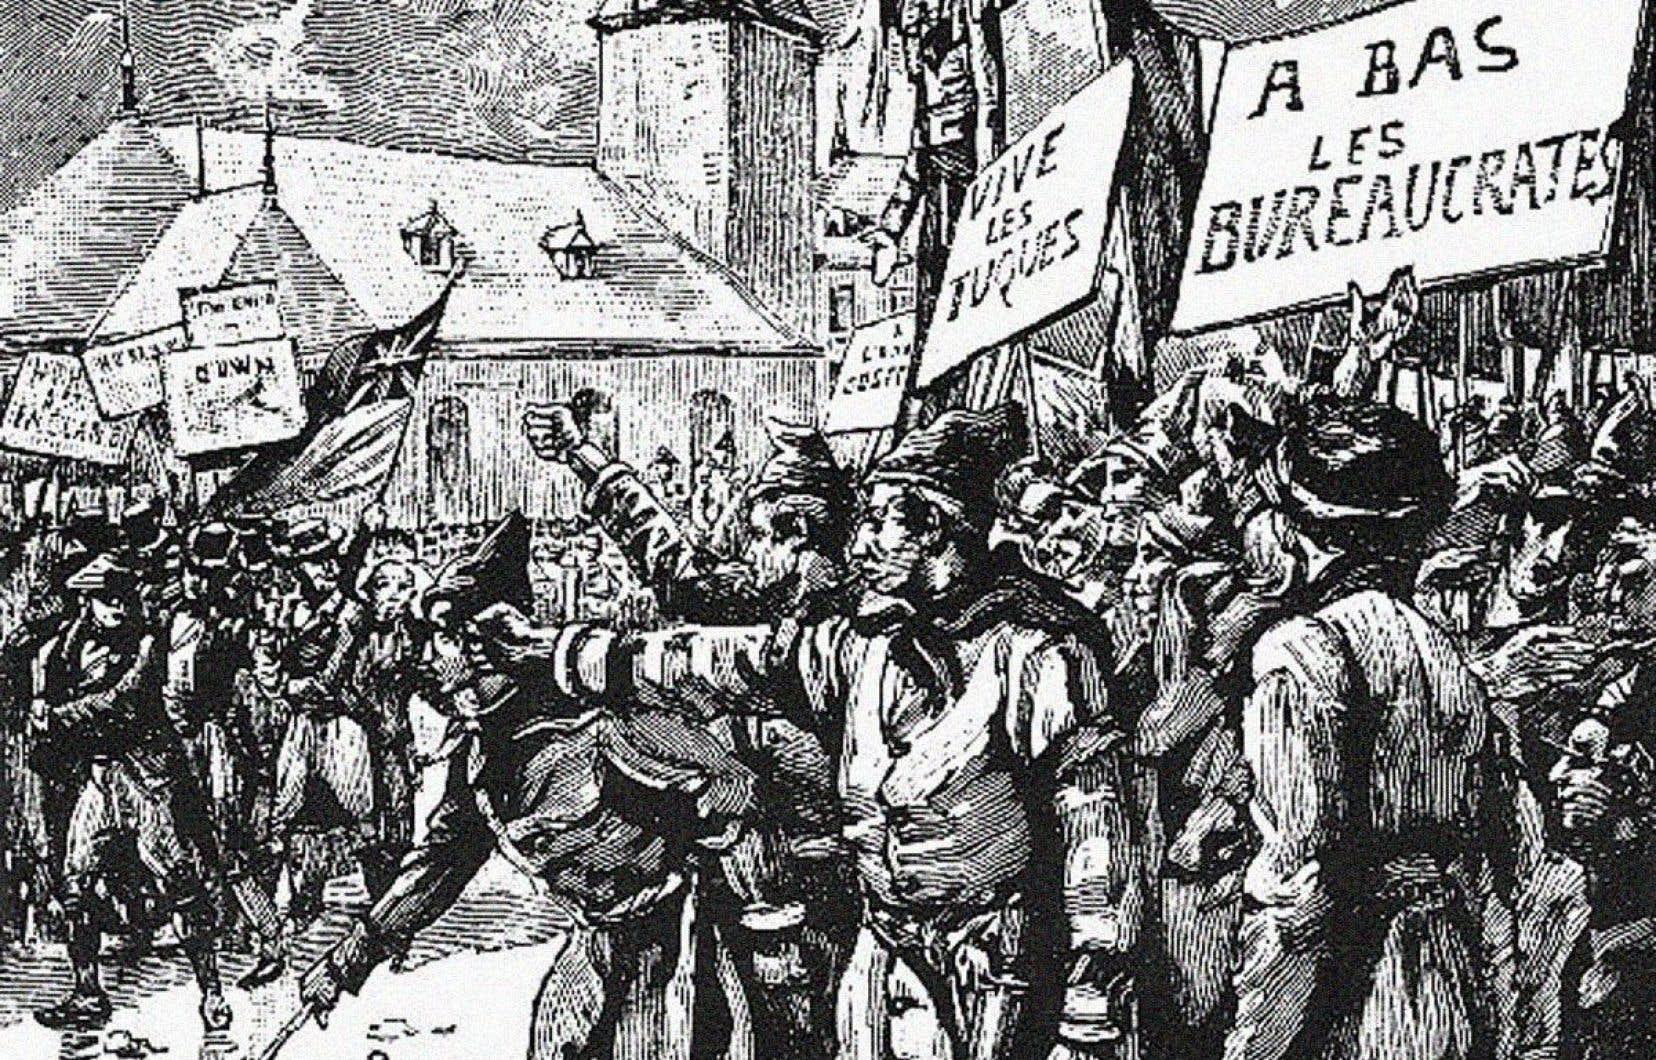 Affrontement du Doric Club contre les Fils de la Liberté en 1837